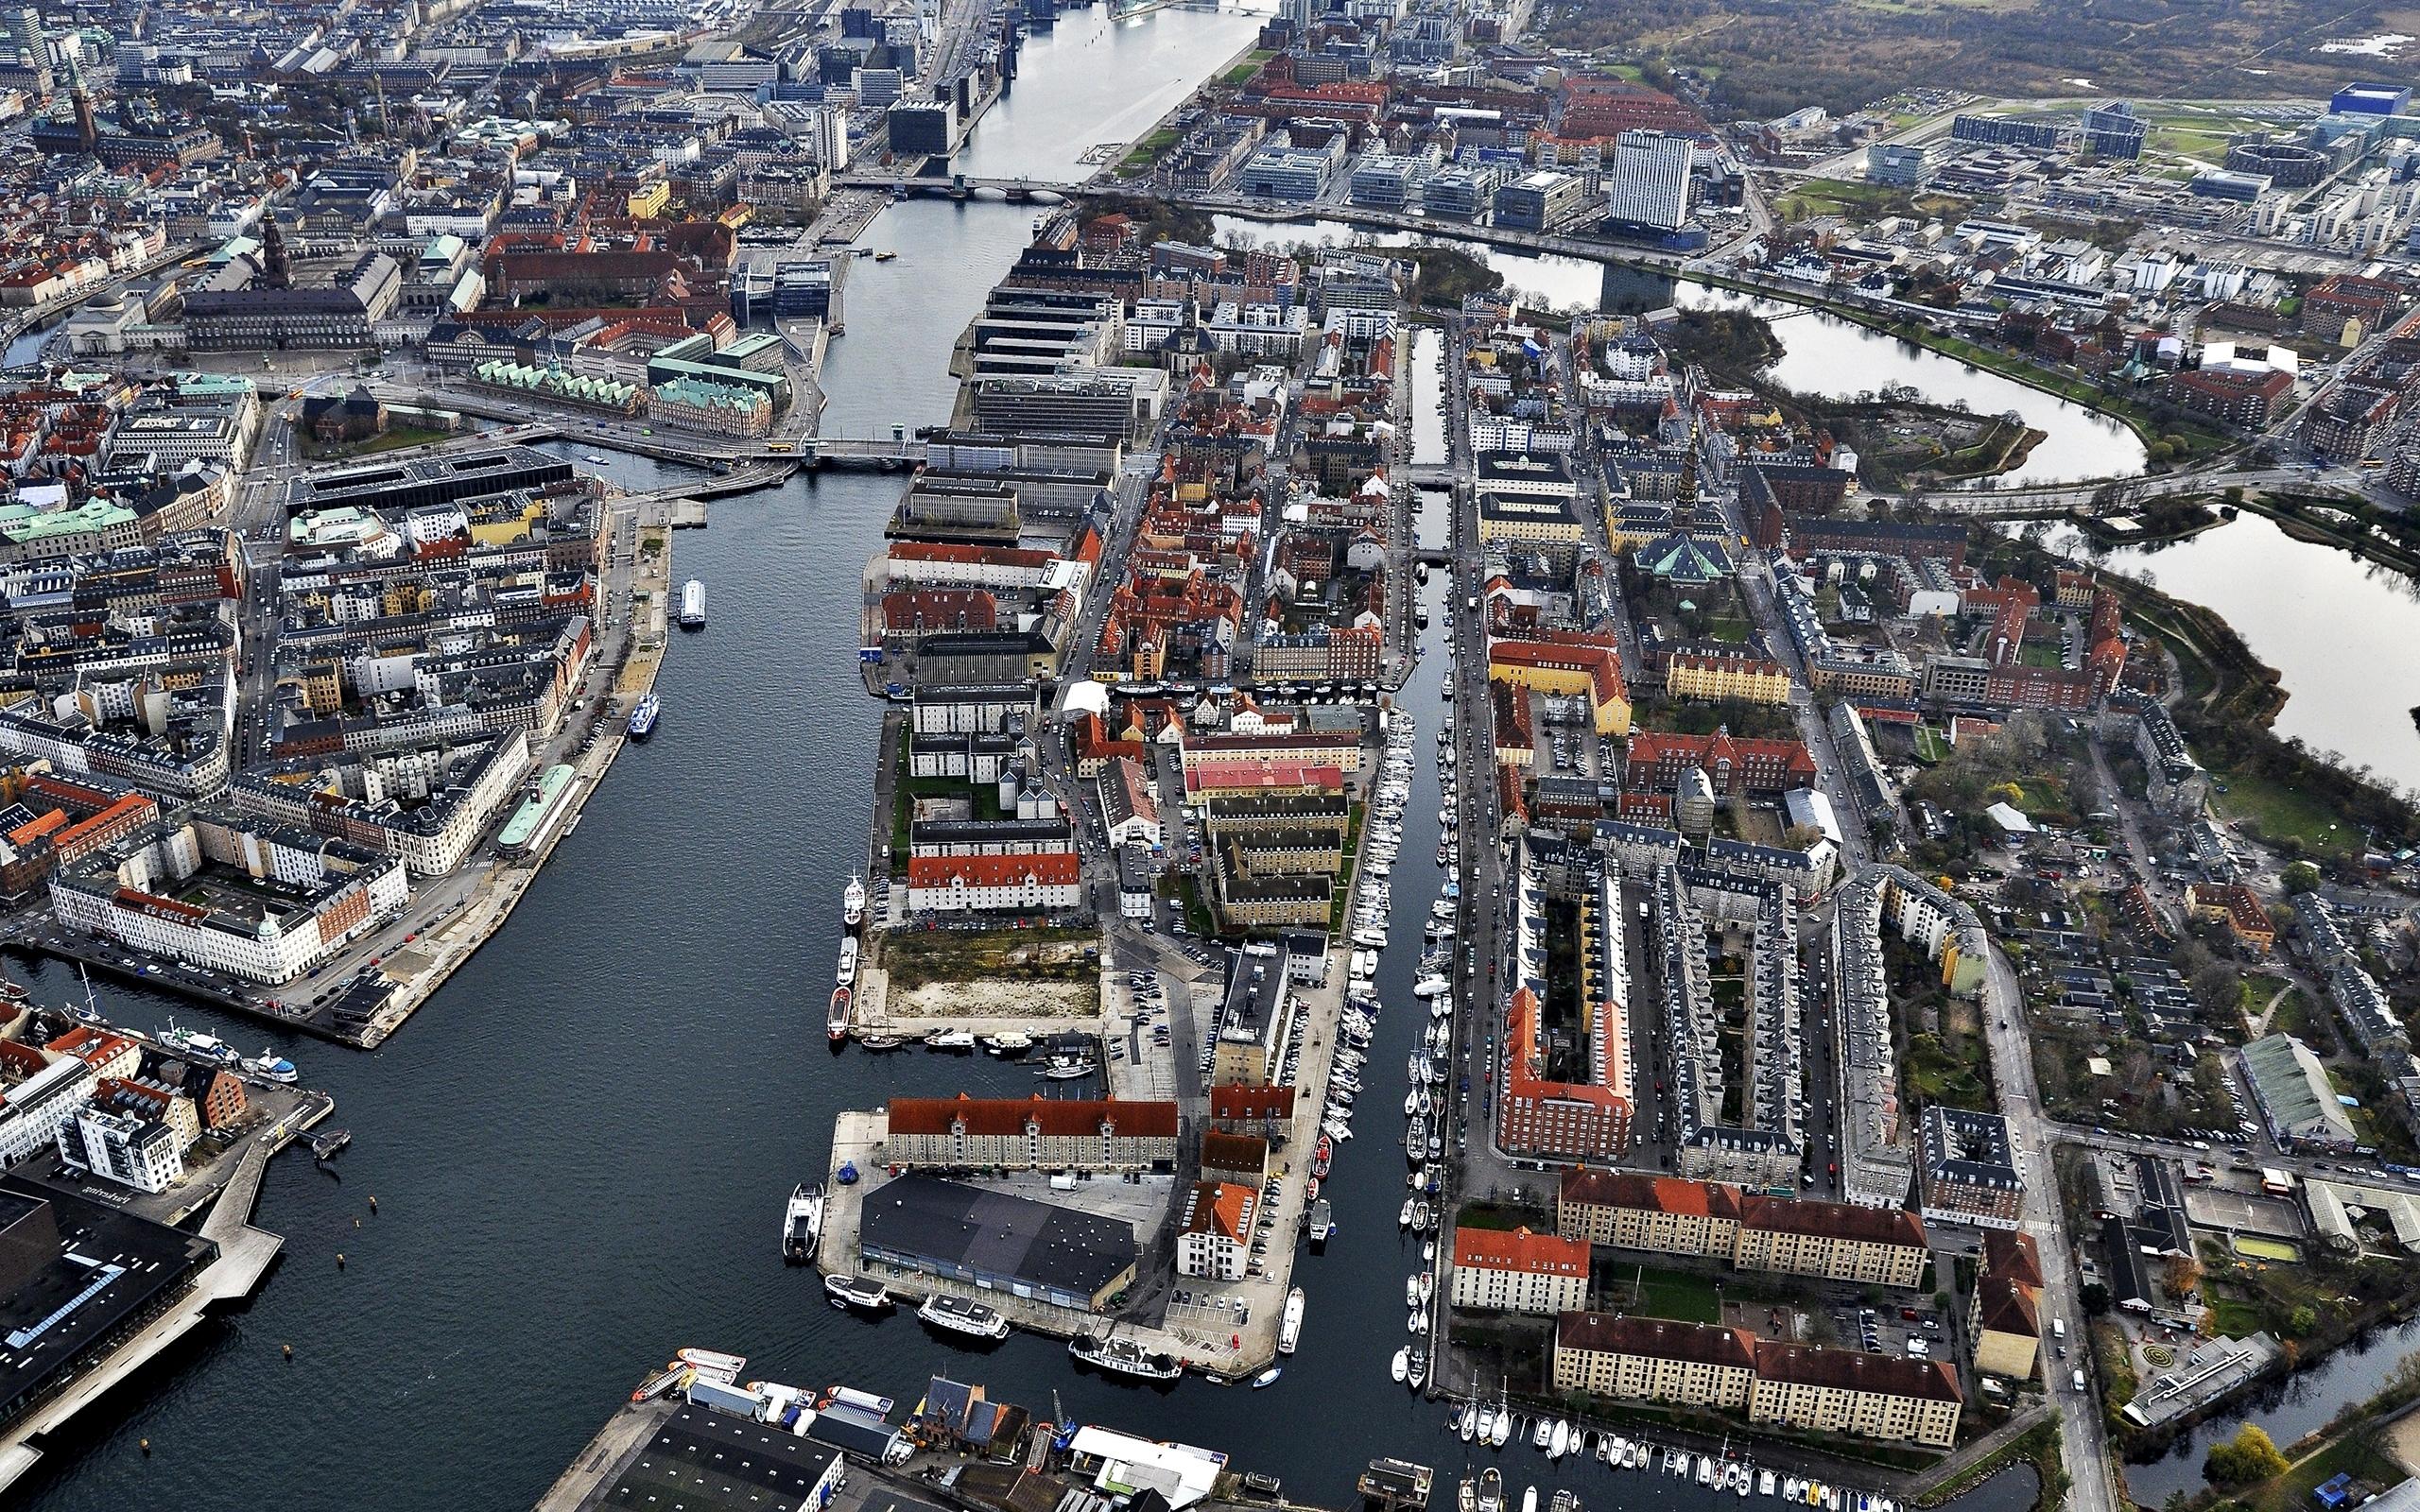 Copenhagen Wallpaper 9   2560 X 1600 stmednet 2560x1600